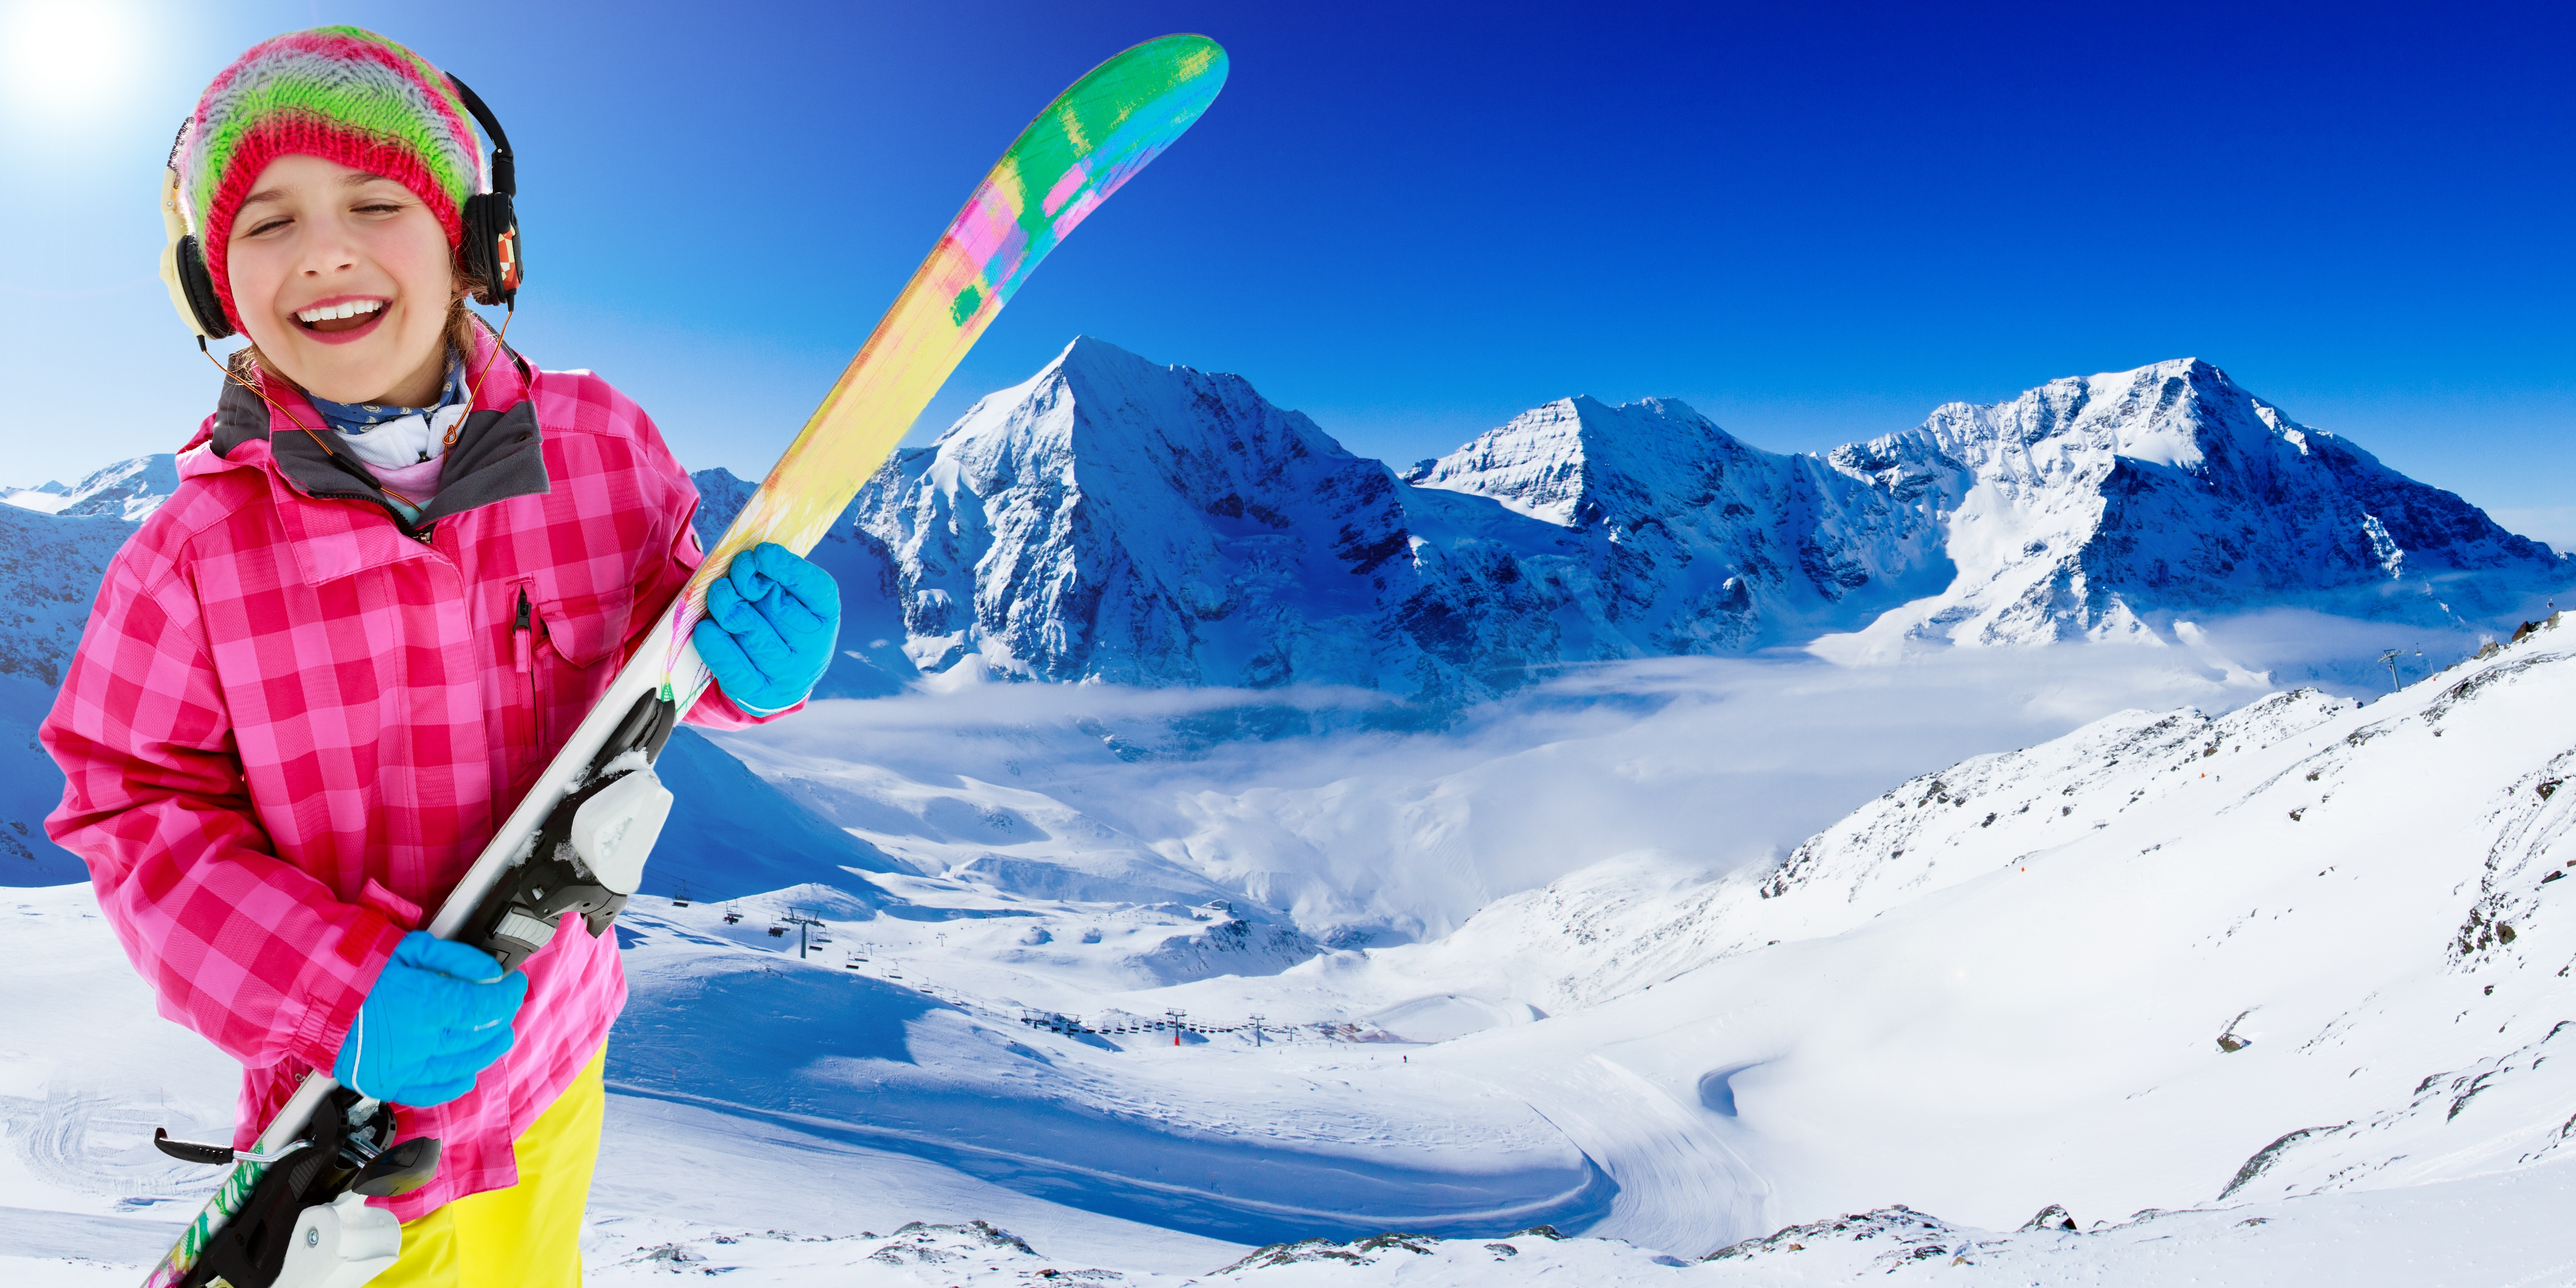 Big ski  skier  winter   lovely girl has a fun on ski